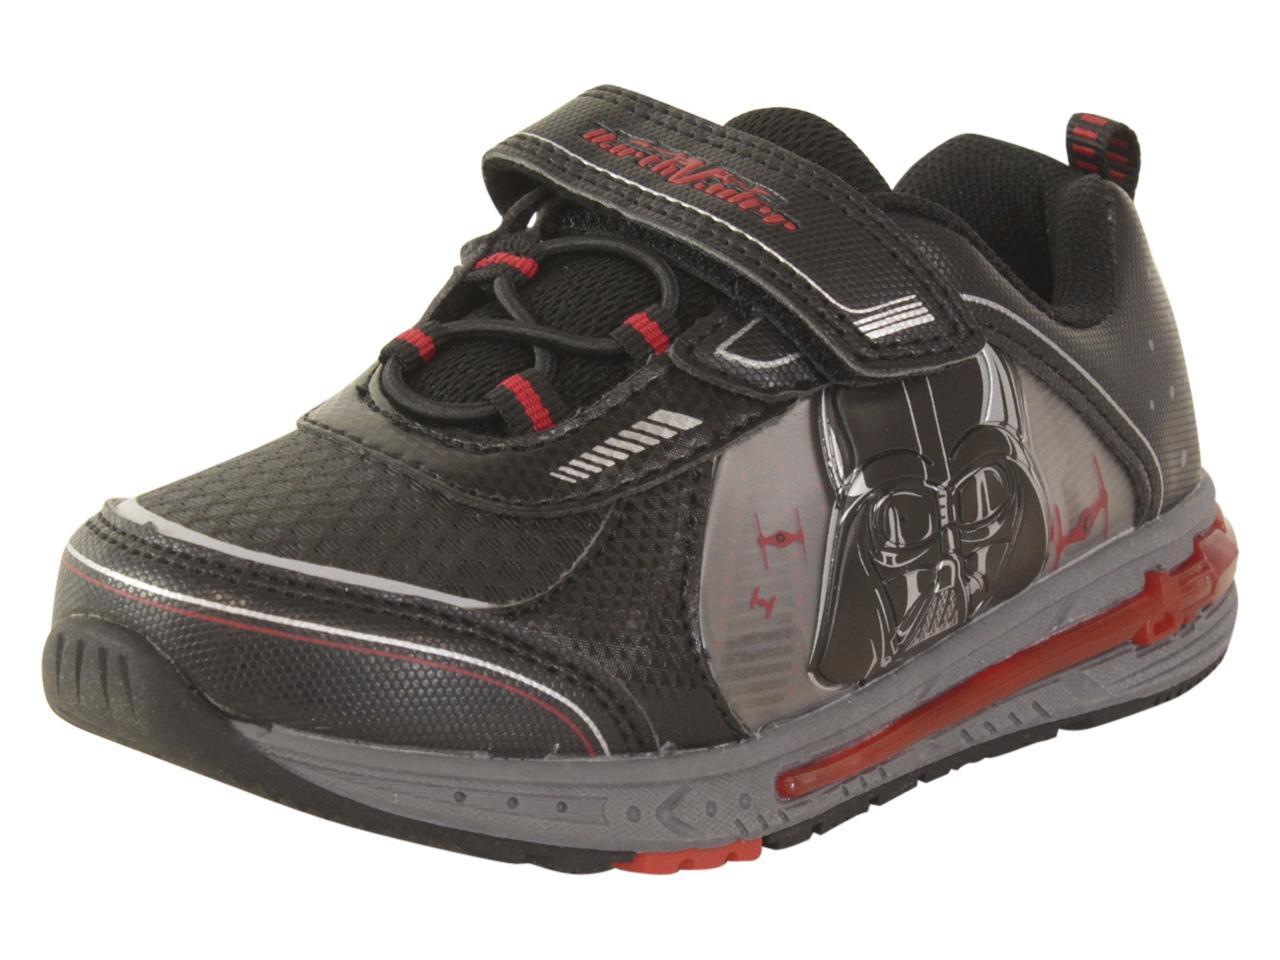 Star Wars Sneakers >> Disney Toddler Little Boy S Star Wars Light Up Sneakers Shoes